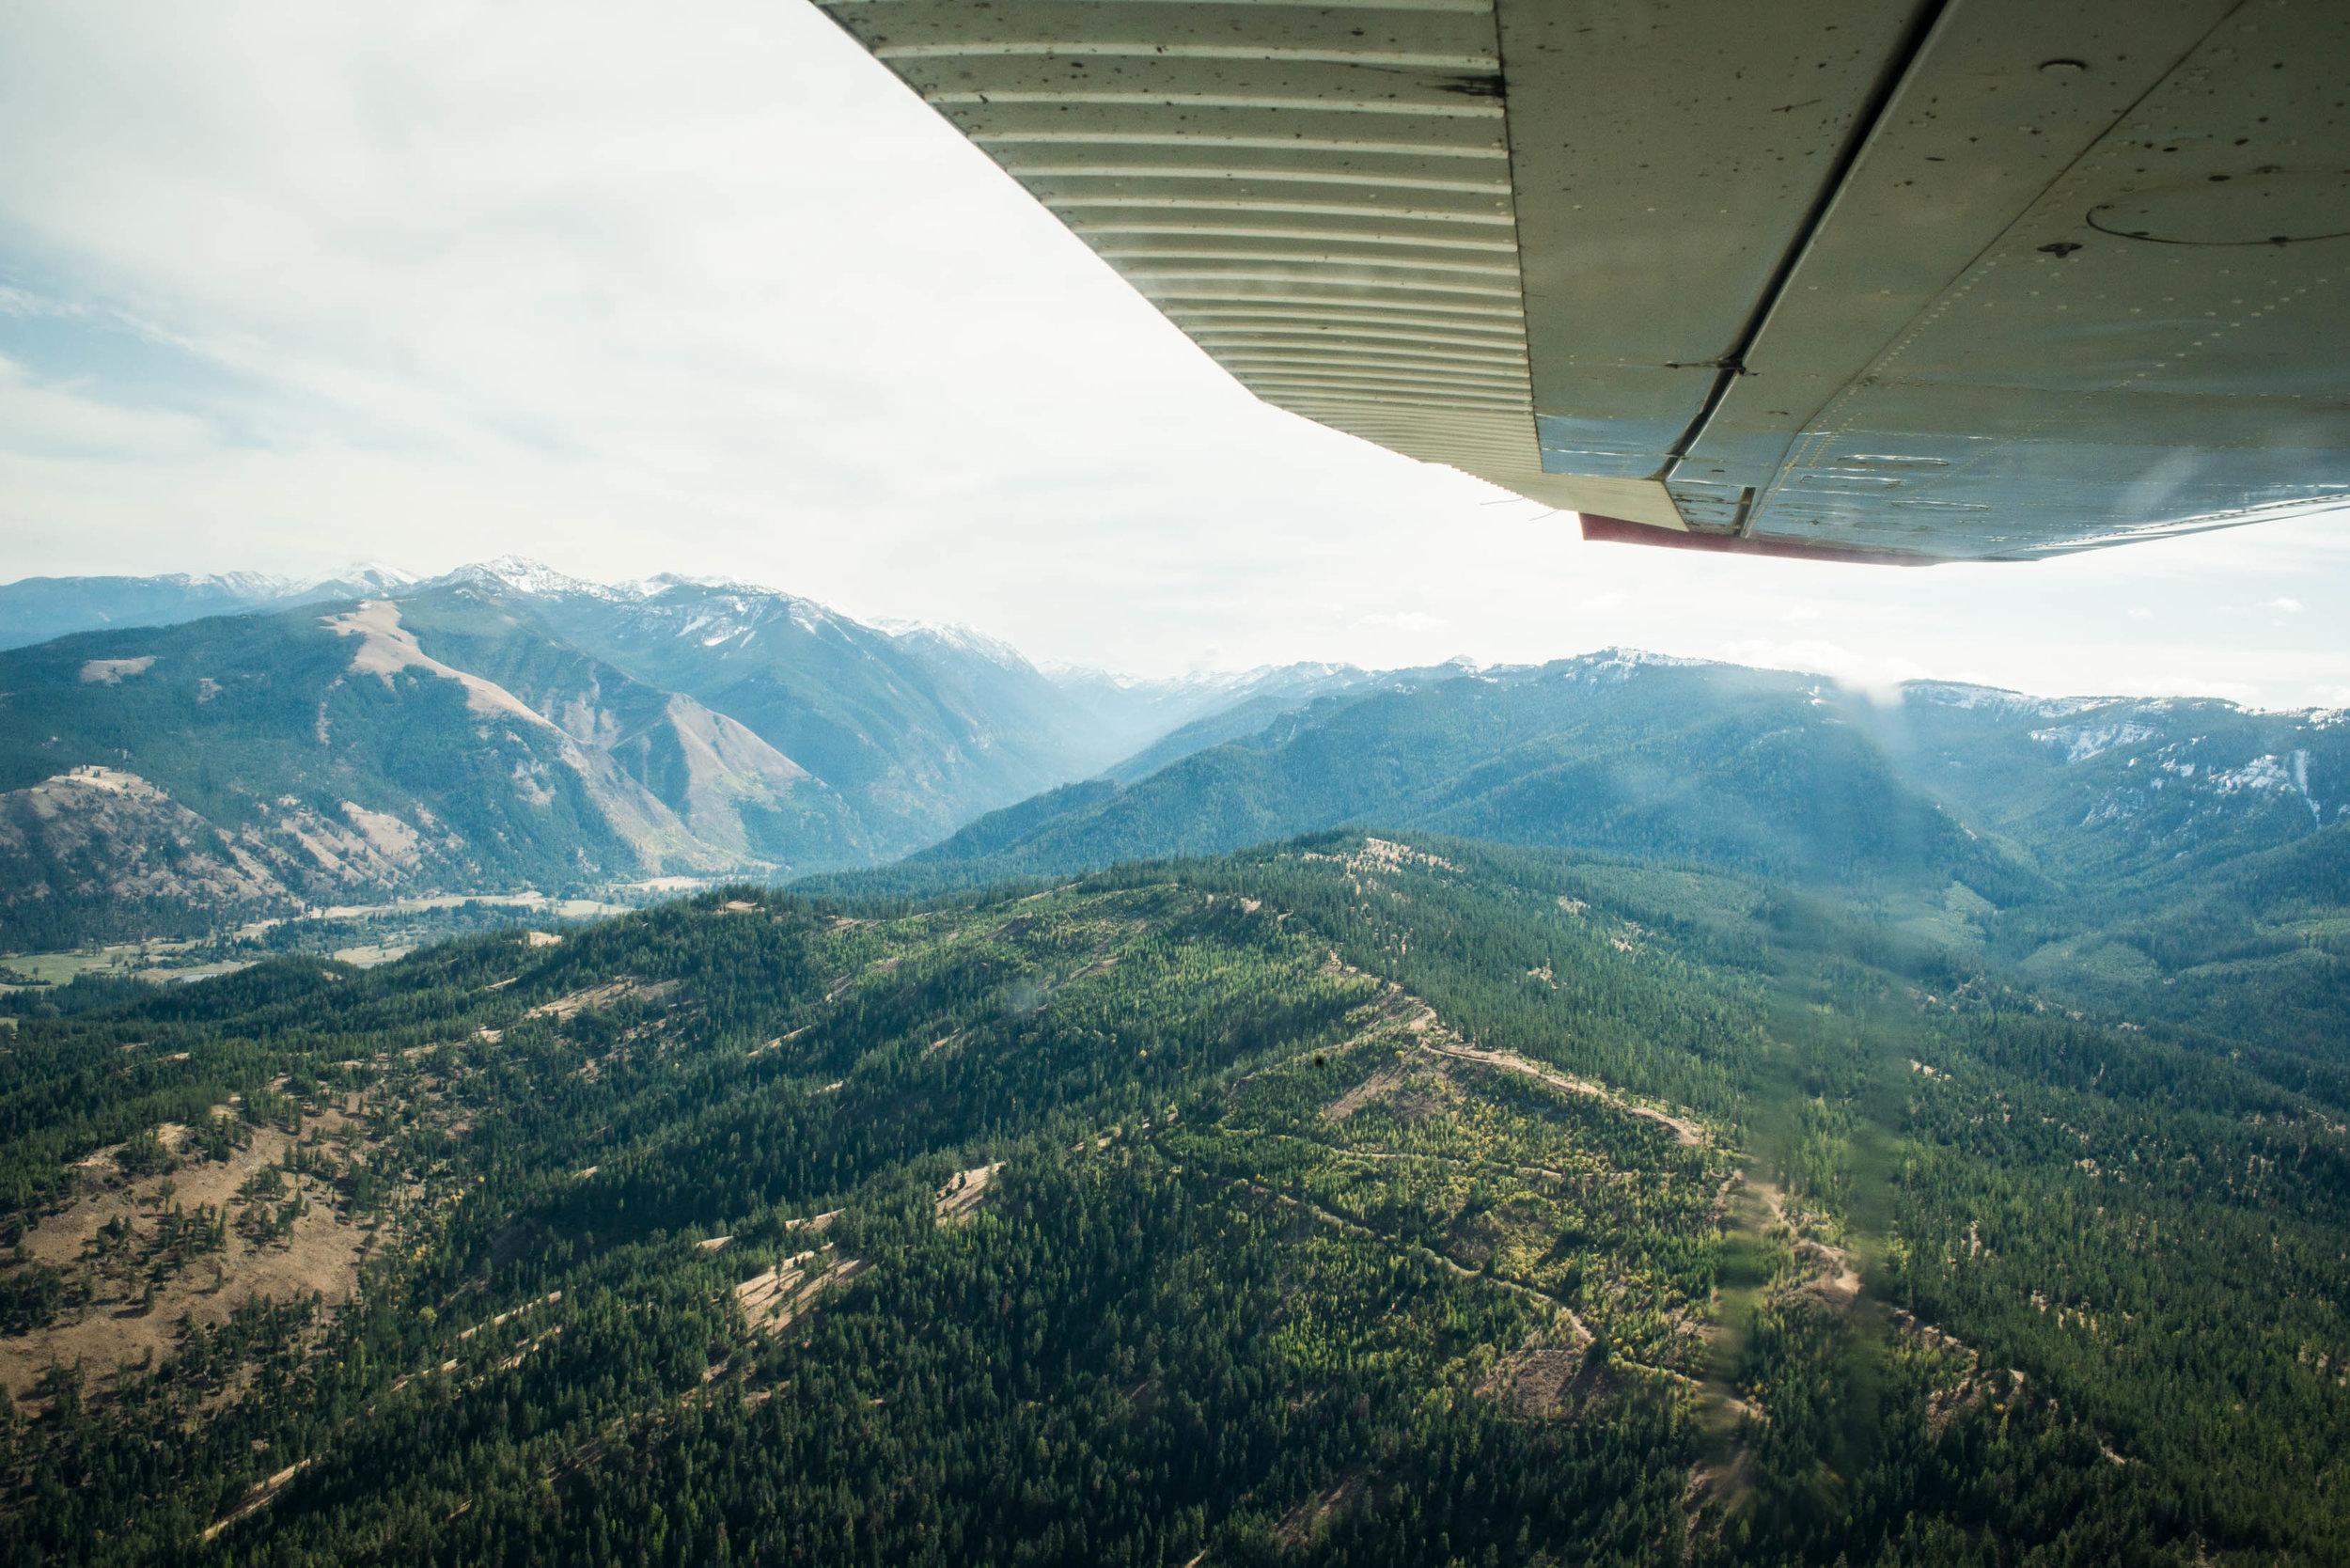 Minam_River_Lodge_Wallowa_Mountains_Eagle_Cap_Wilderness_Oregon_Autumn_2017_Please_Credit_Talia_Jean_Galvin-2.jpg